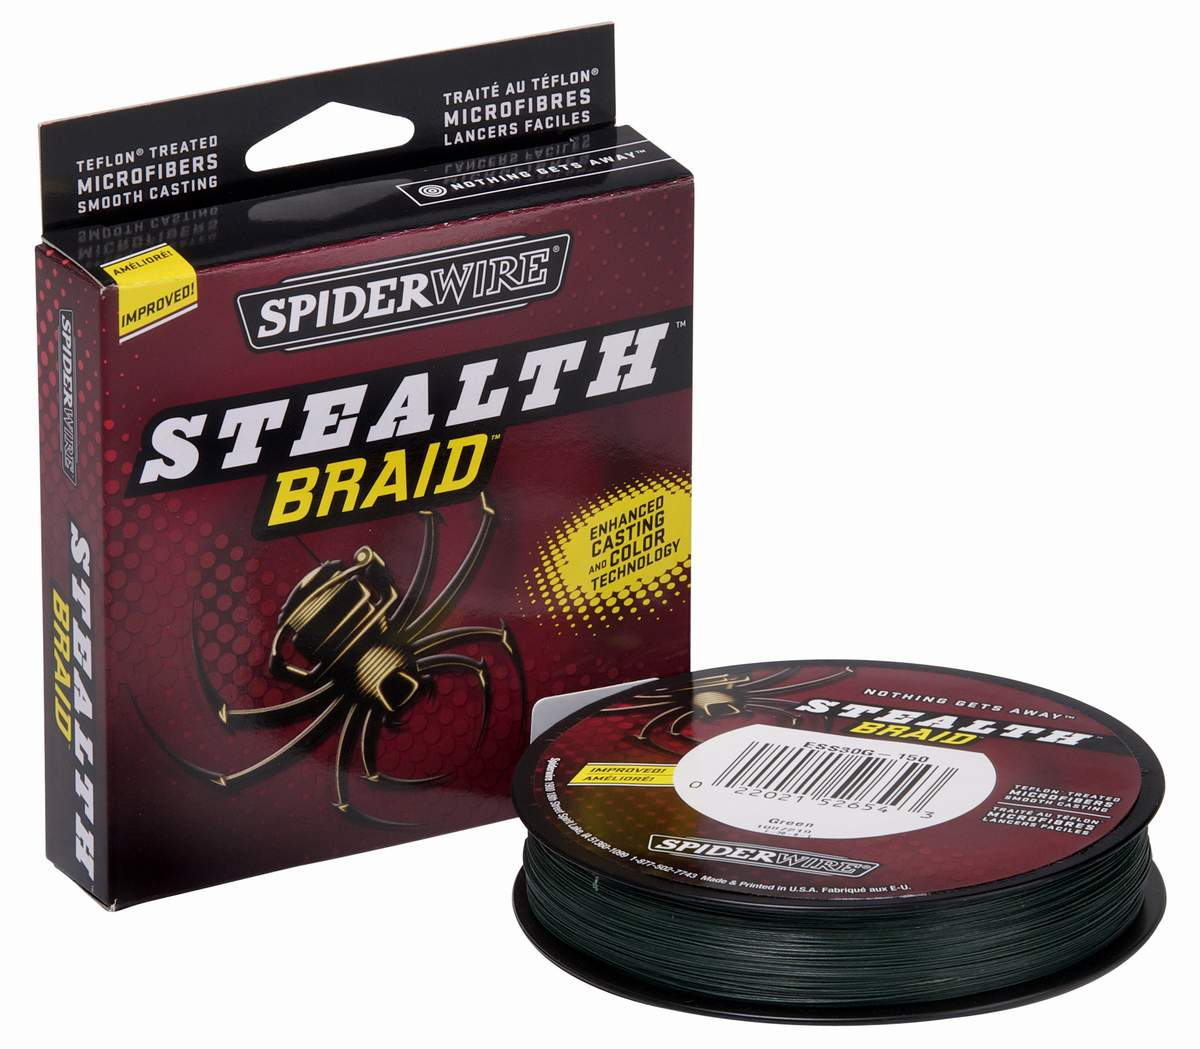 Spiderwire stealth braid fra N/A på fiskegrej.dk